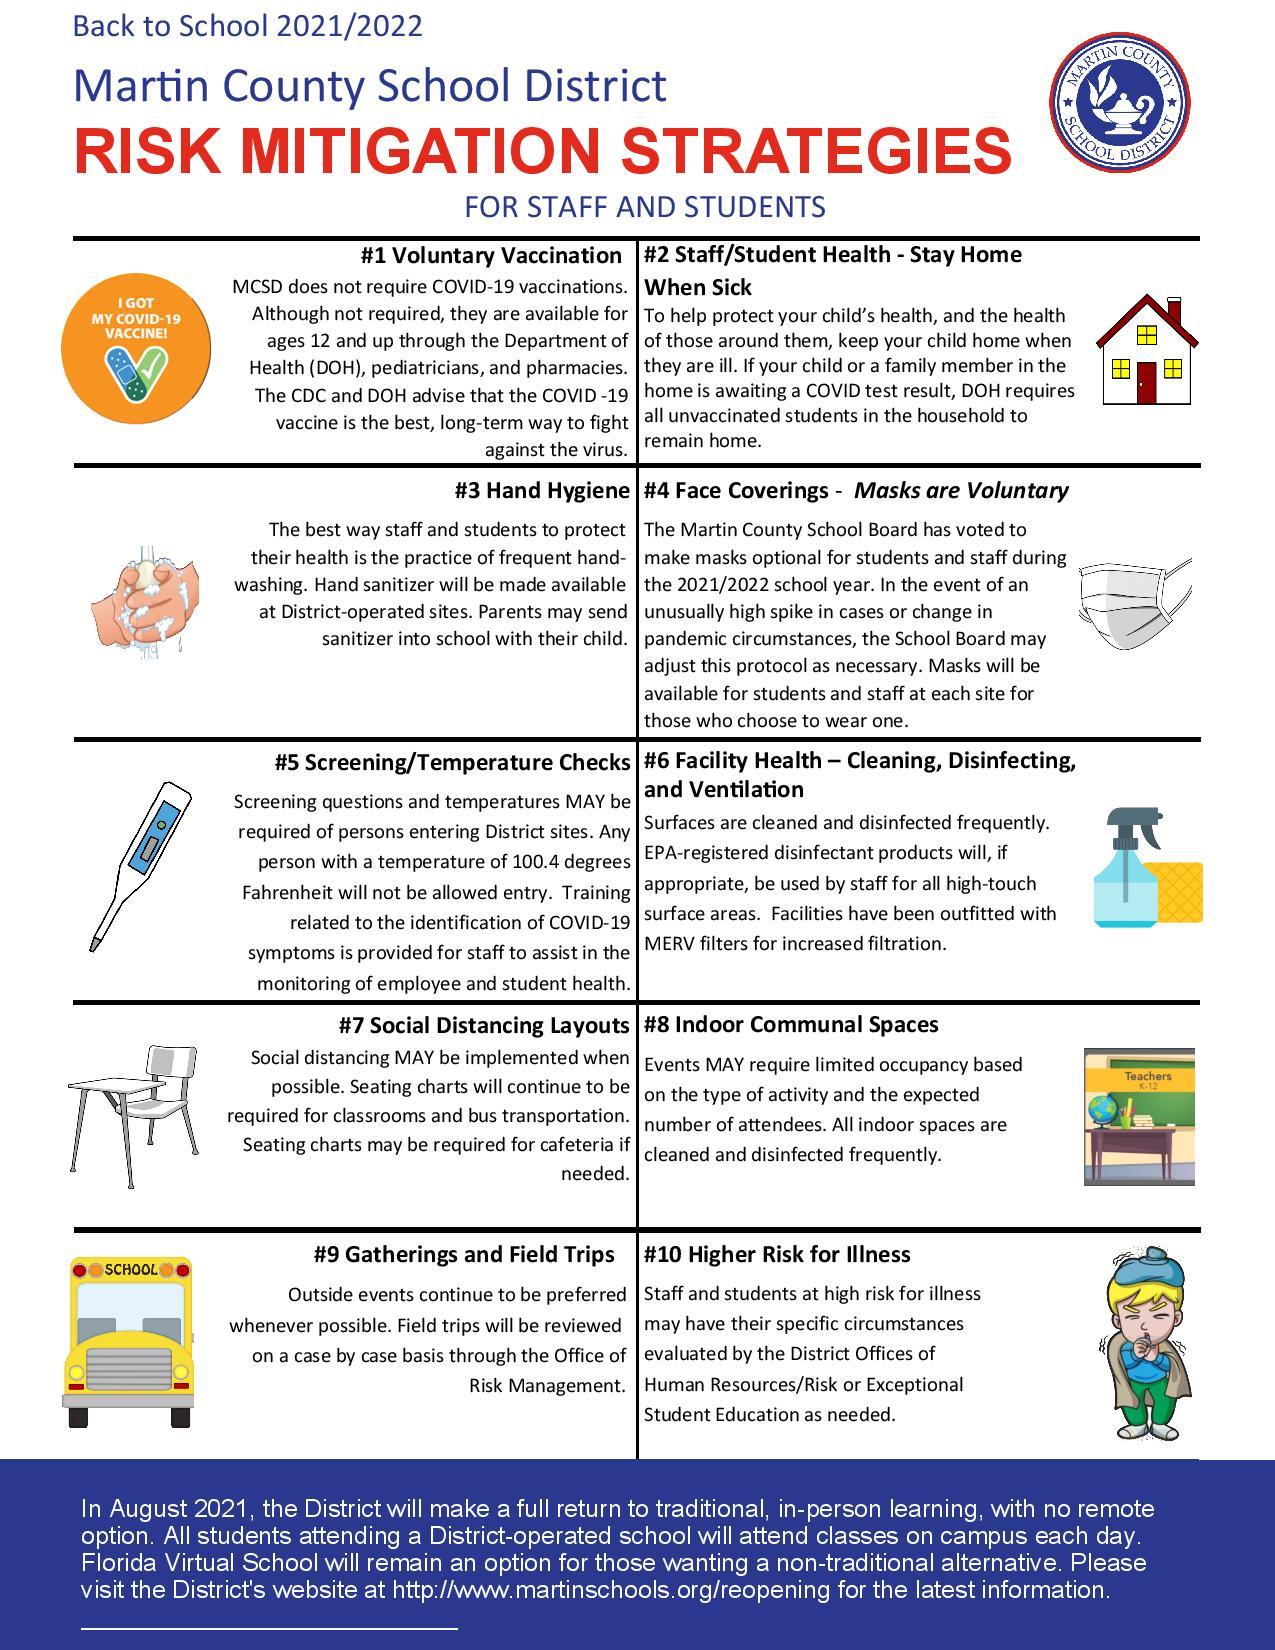 Risk Mitigation Strategies - Board Approved July 20, 2021